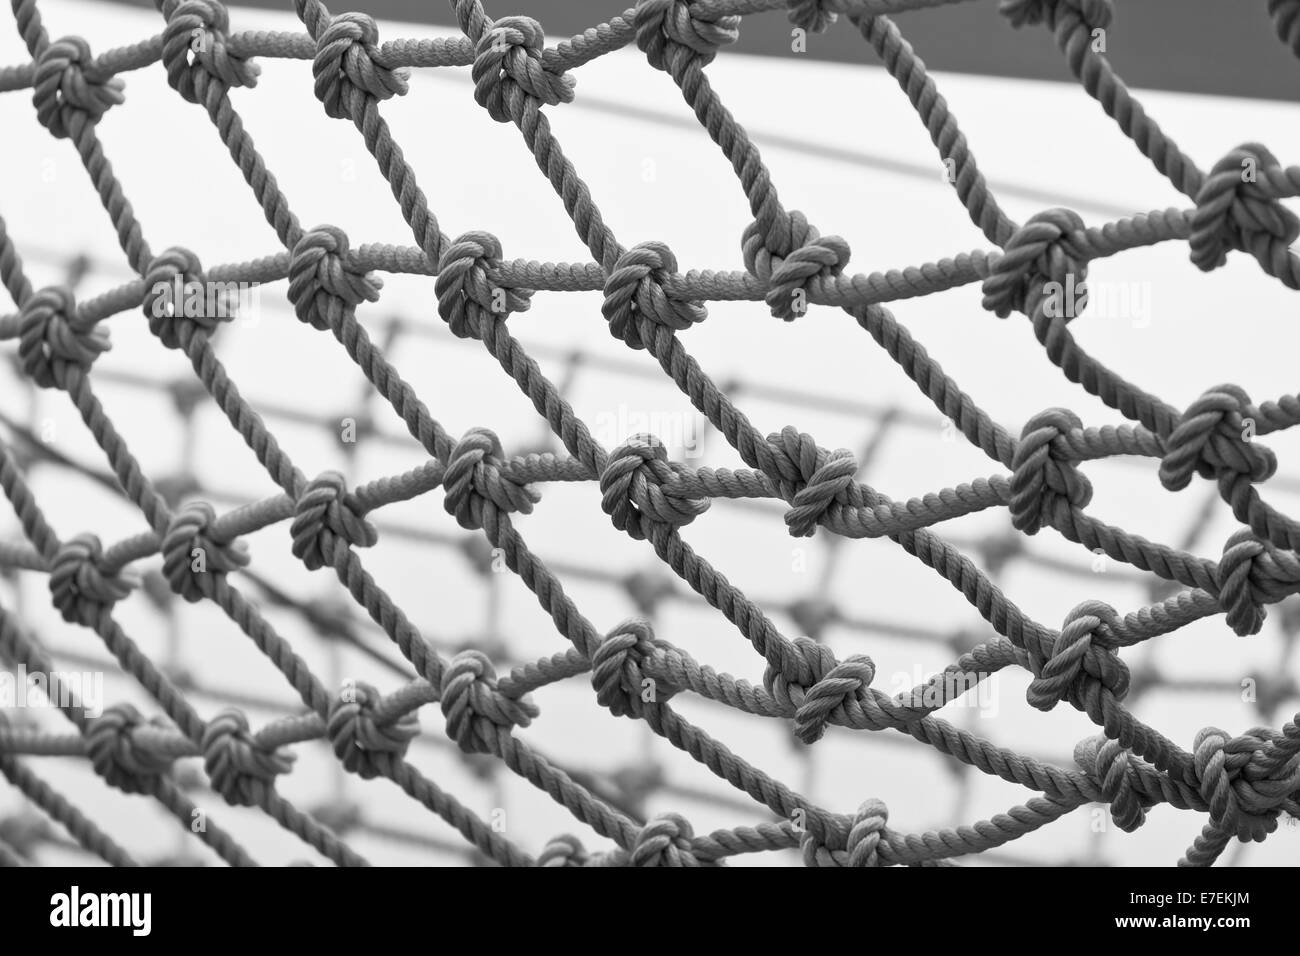 Yacht Safety Net Close Up. Horizontal black and white shot - Stock Image